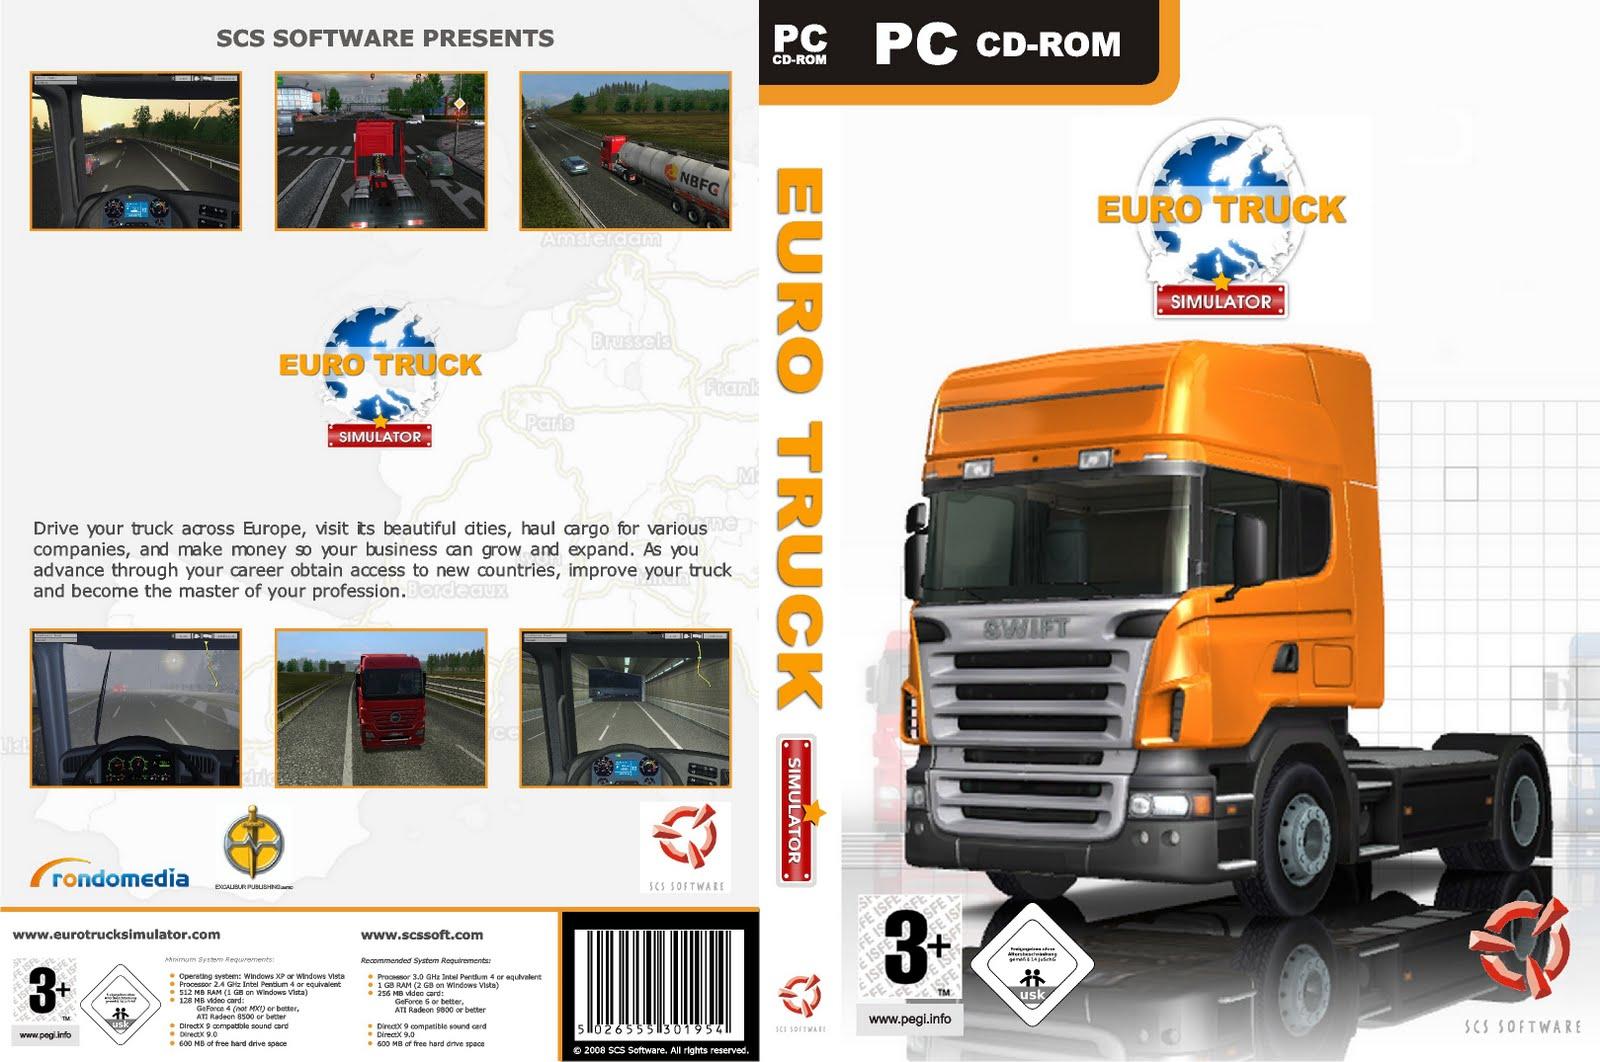 http://3.bp.blogspot.com/_8DDnkR0-_5Q/TDzMwPCo8dI/AAAAAAAAAME/RsZpxcunckA/s1600/Euro_Truck_Simulator_Custom-%5Bcdcovers_cc%5D-front.jpg